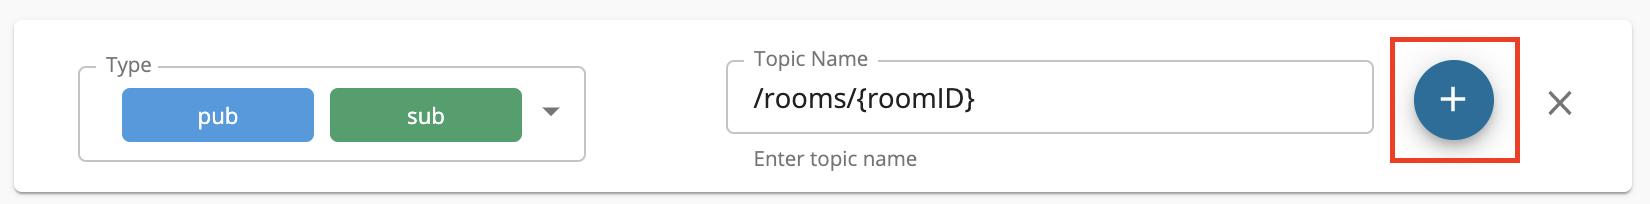 Add Topics to WebSocket API